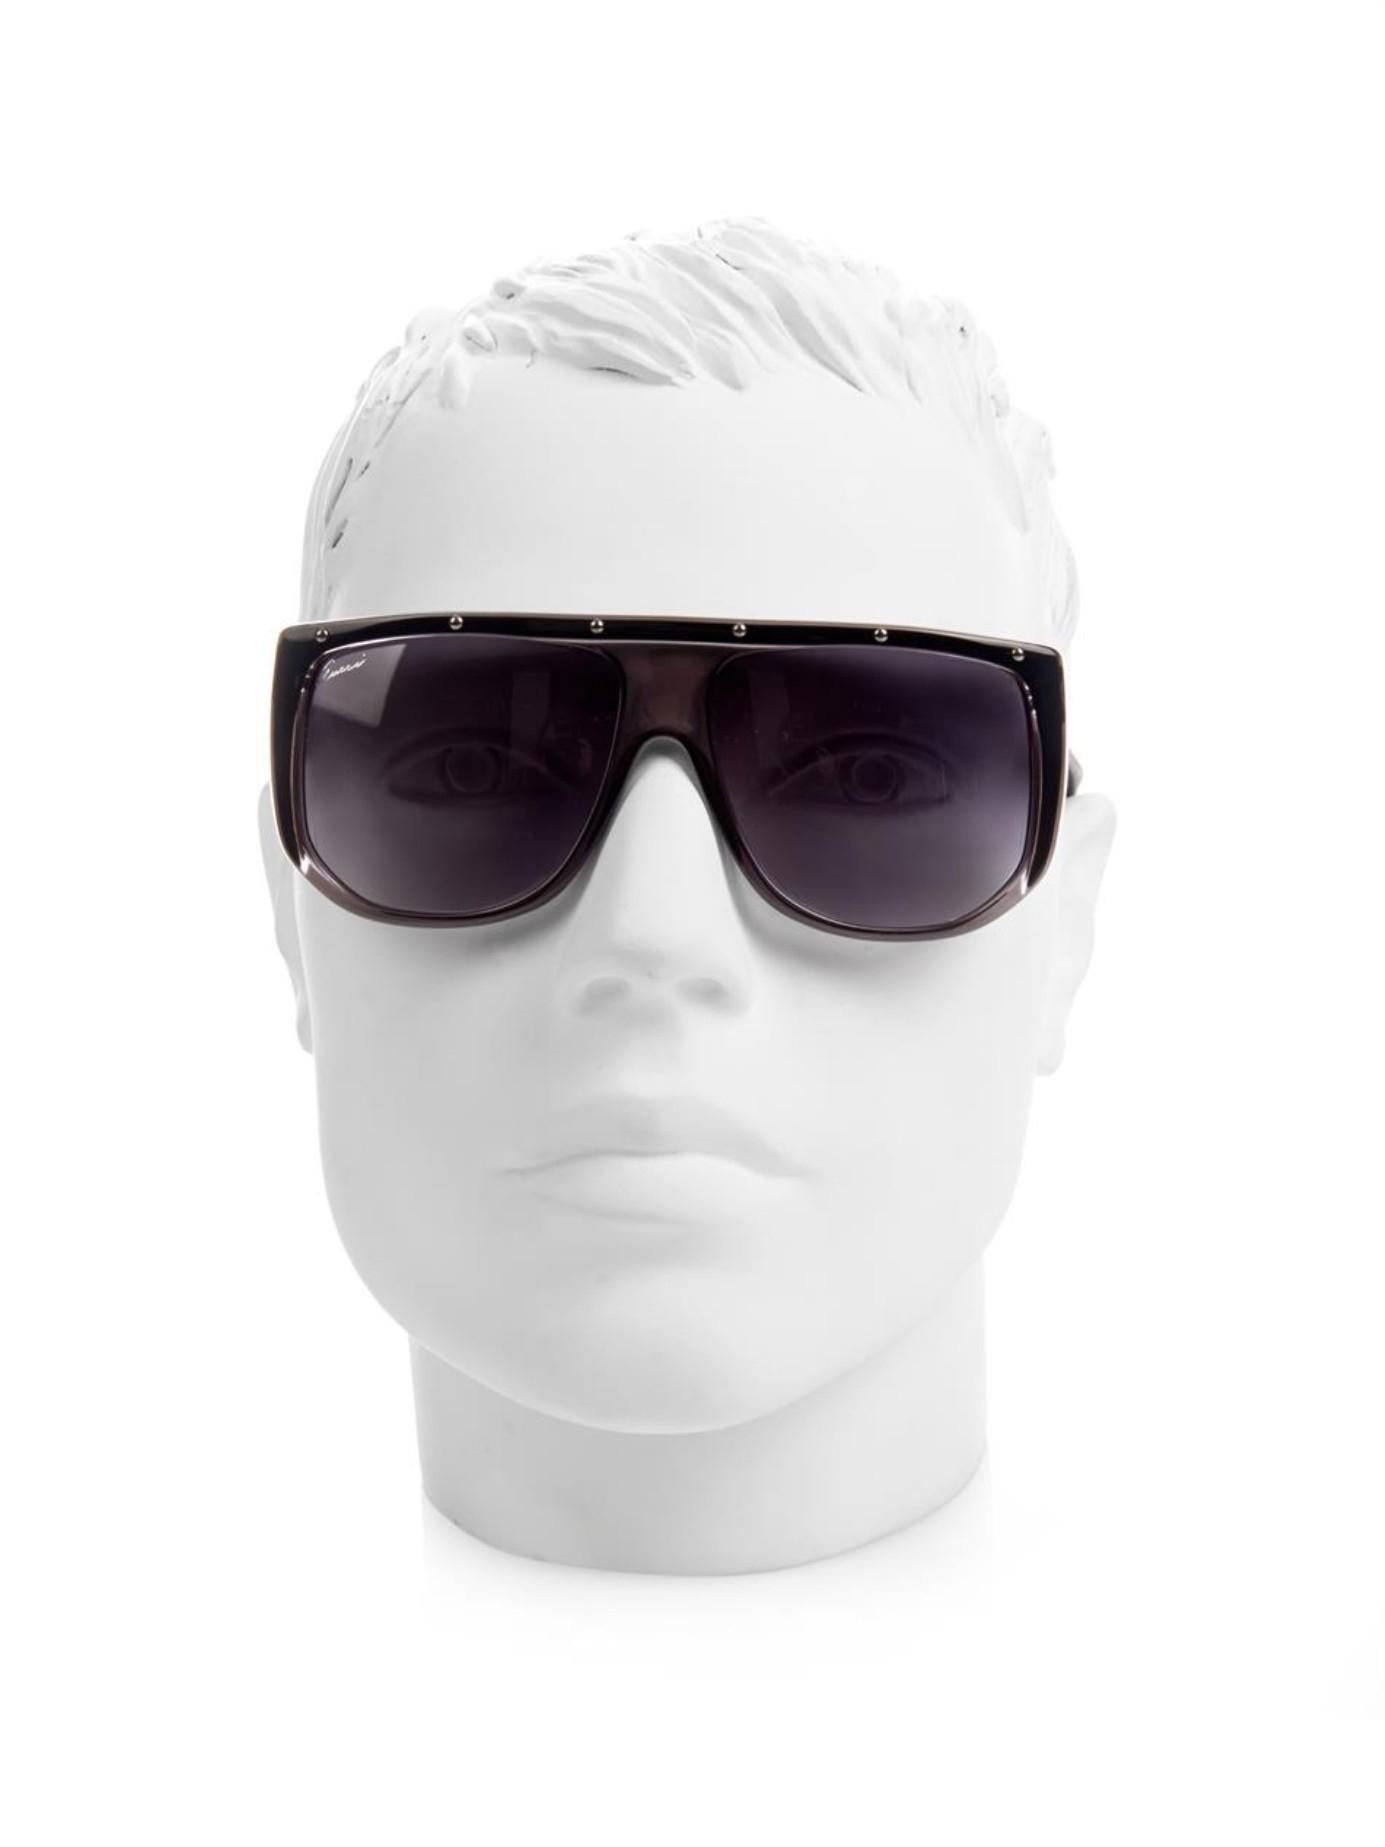 sunglasses aviator style  Gucci Studded Aviator-Style Sunglasses in Black for Men